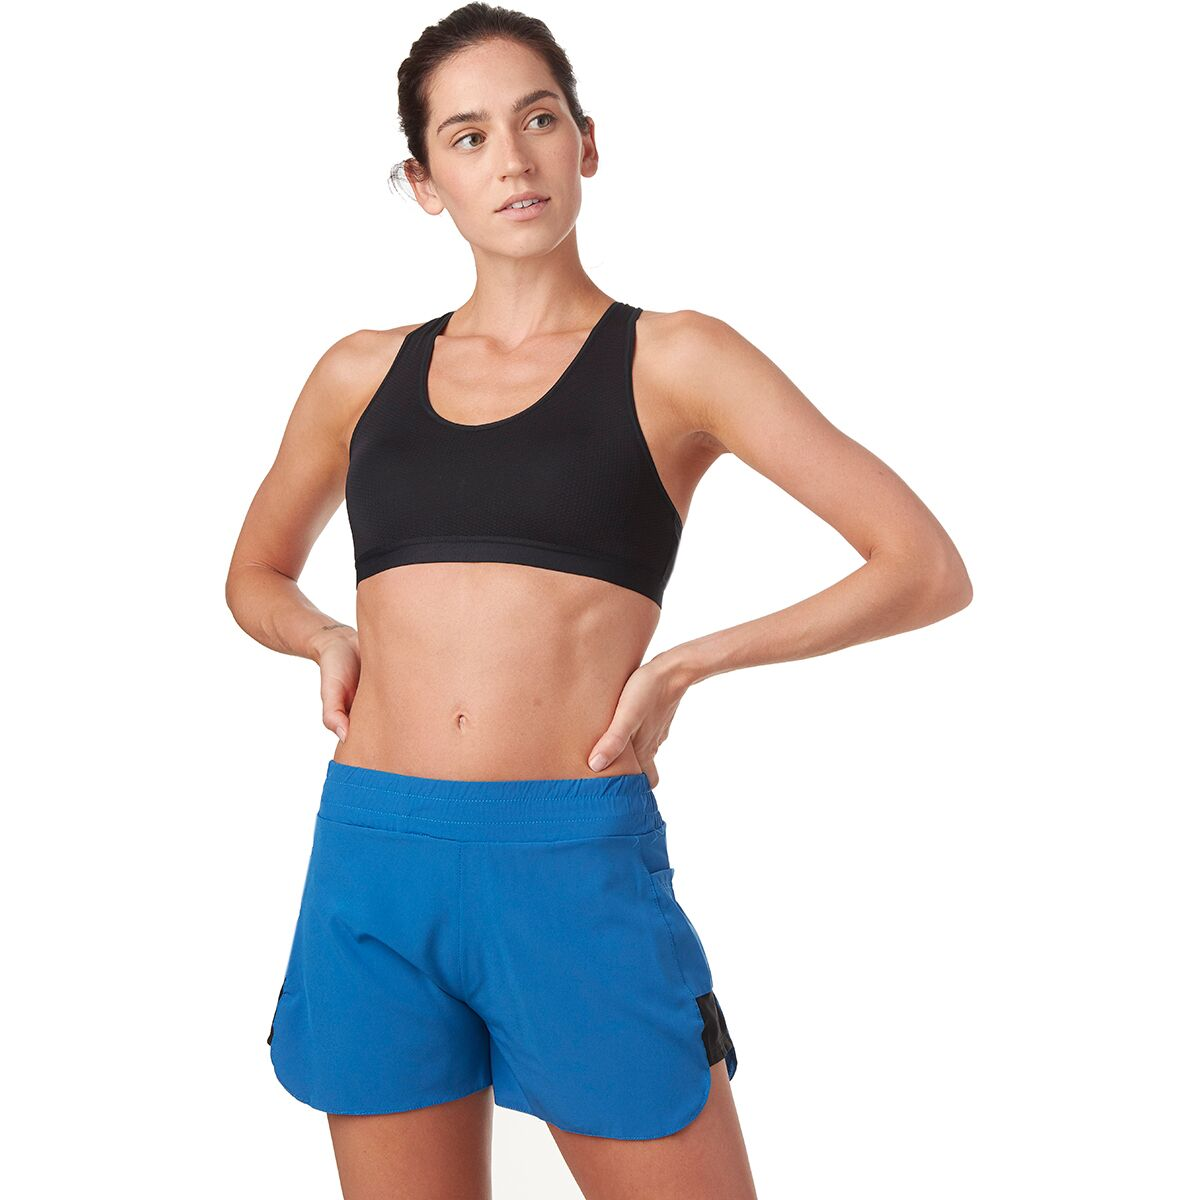 ExOfficio Womens Give-N-Go Sport Mesh Bralette